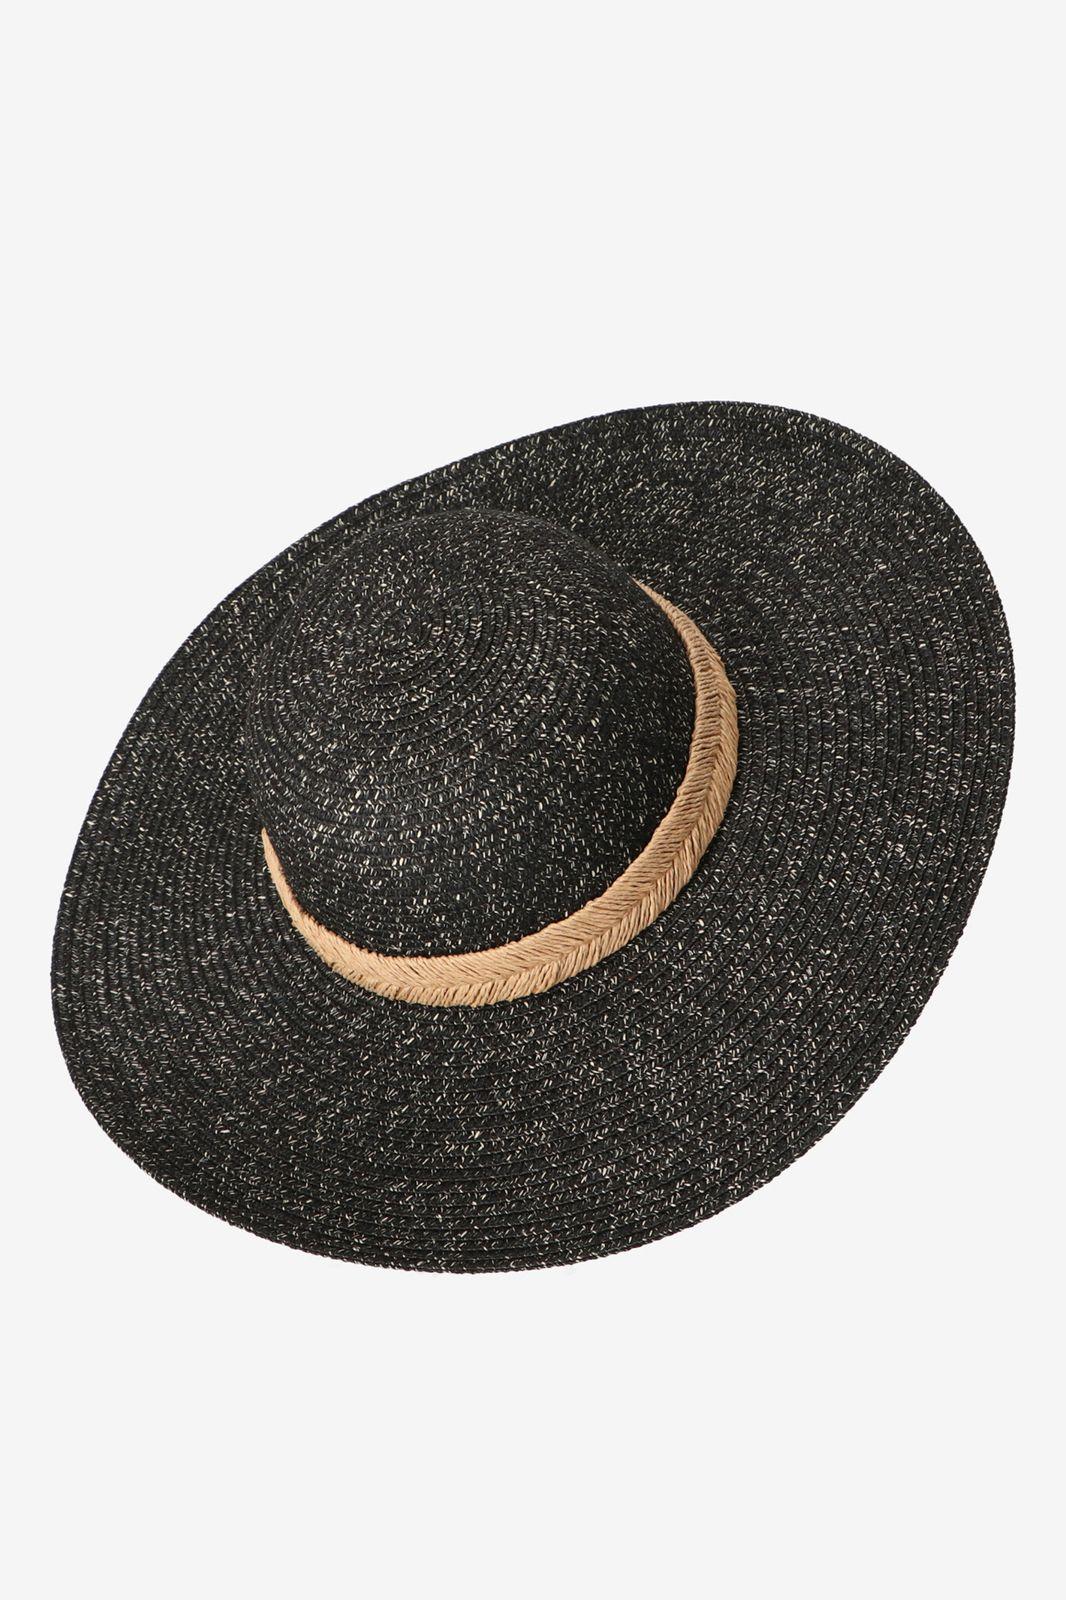 Zwarte rieten hoed